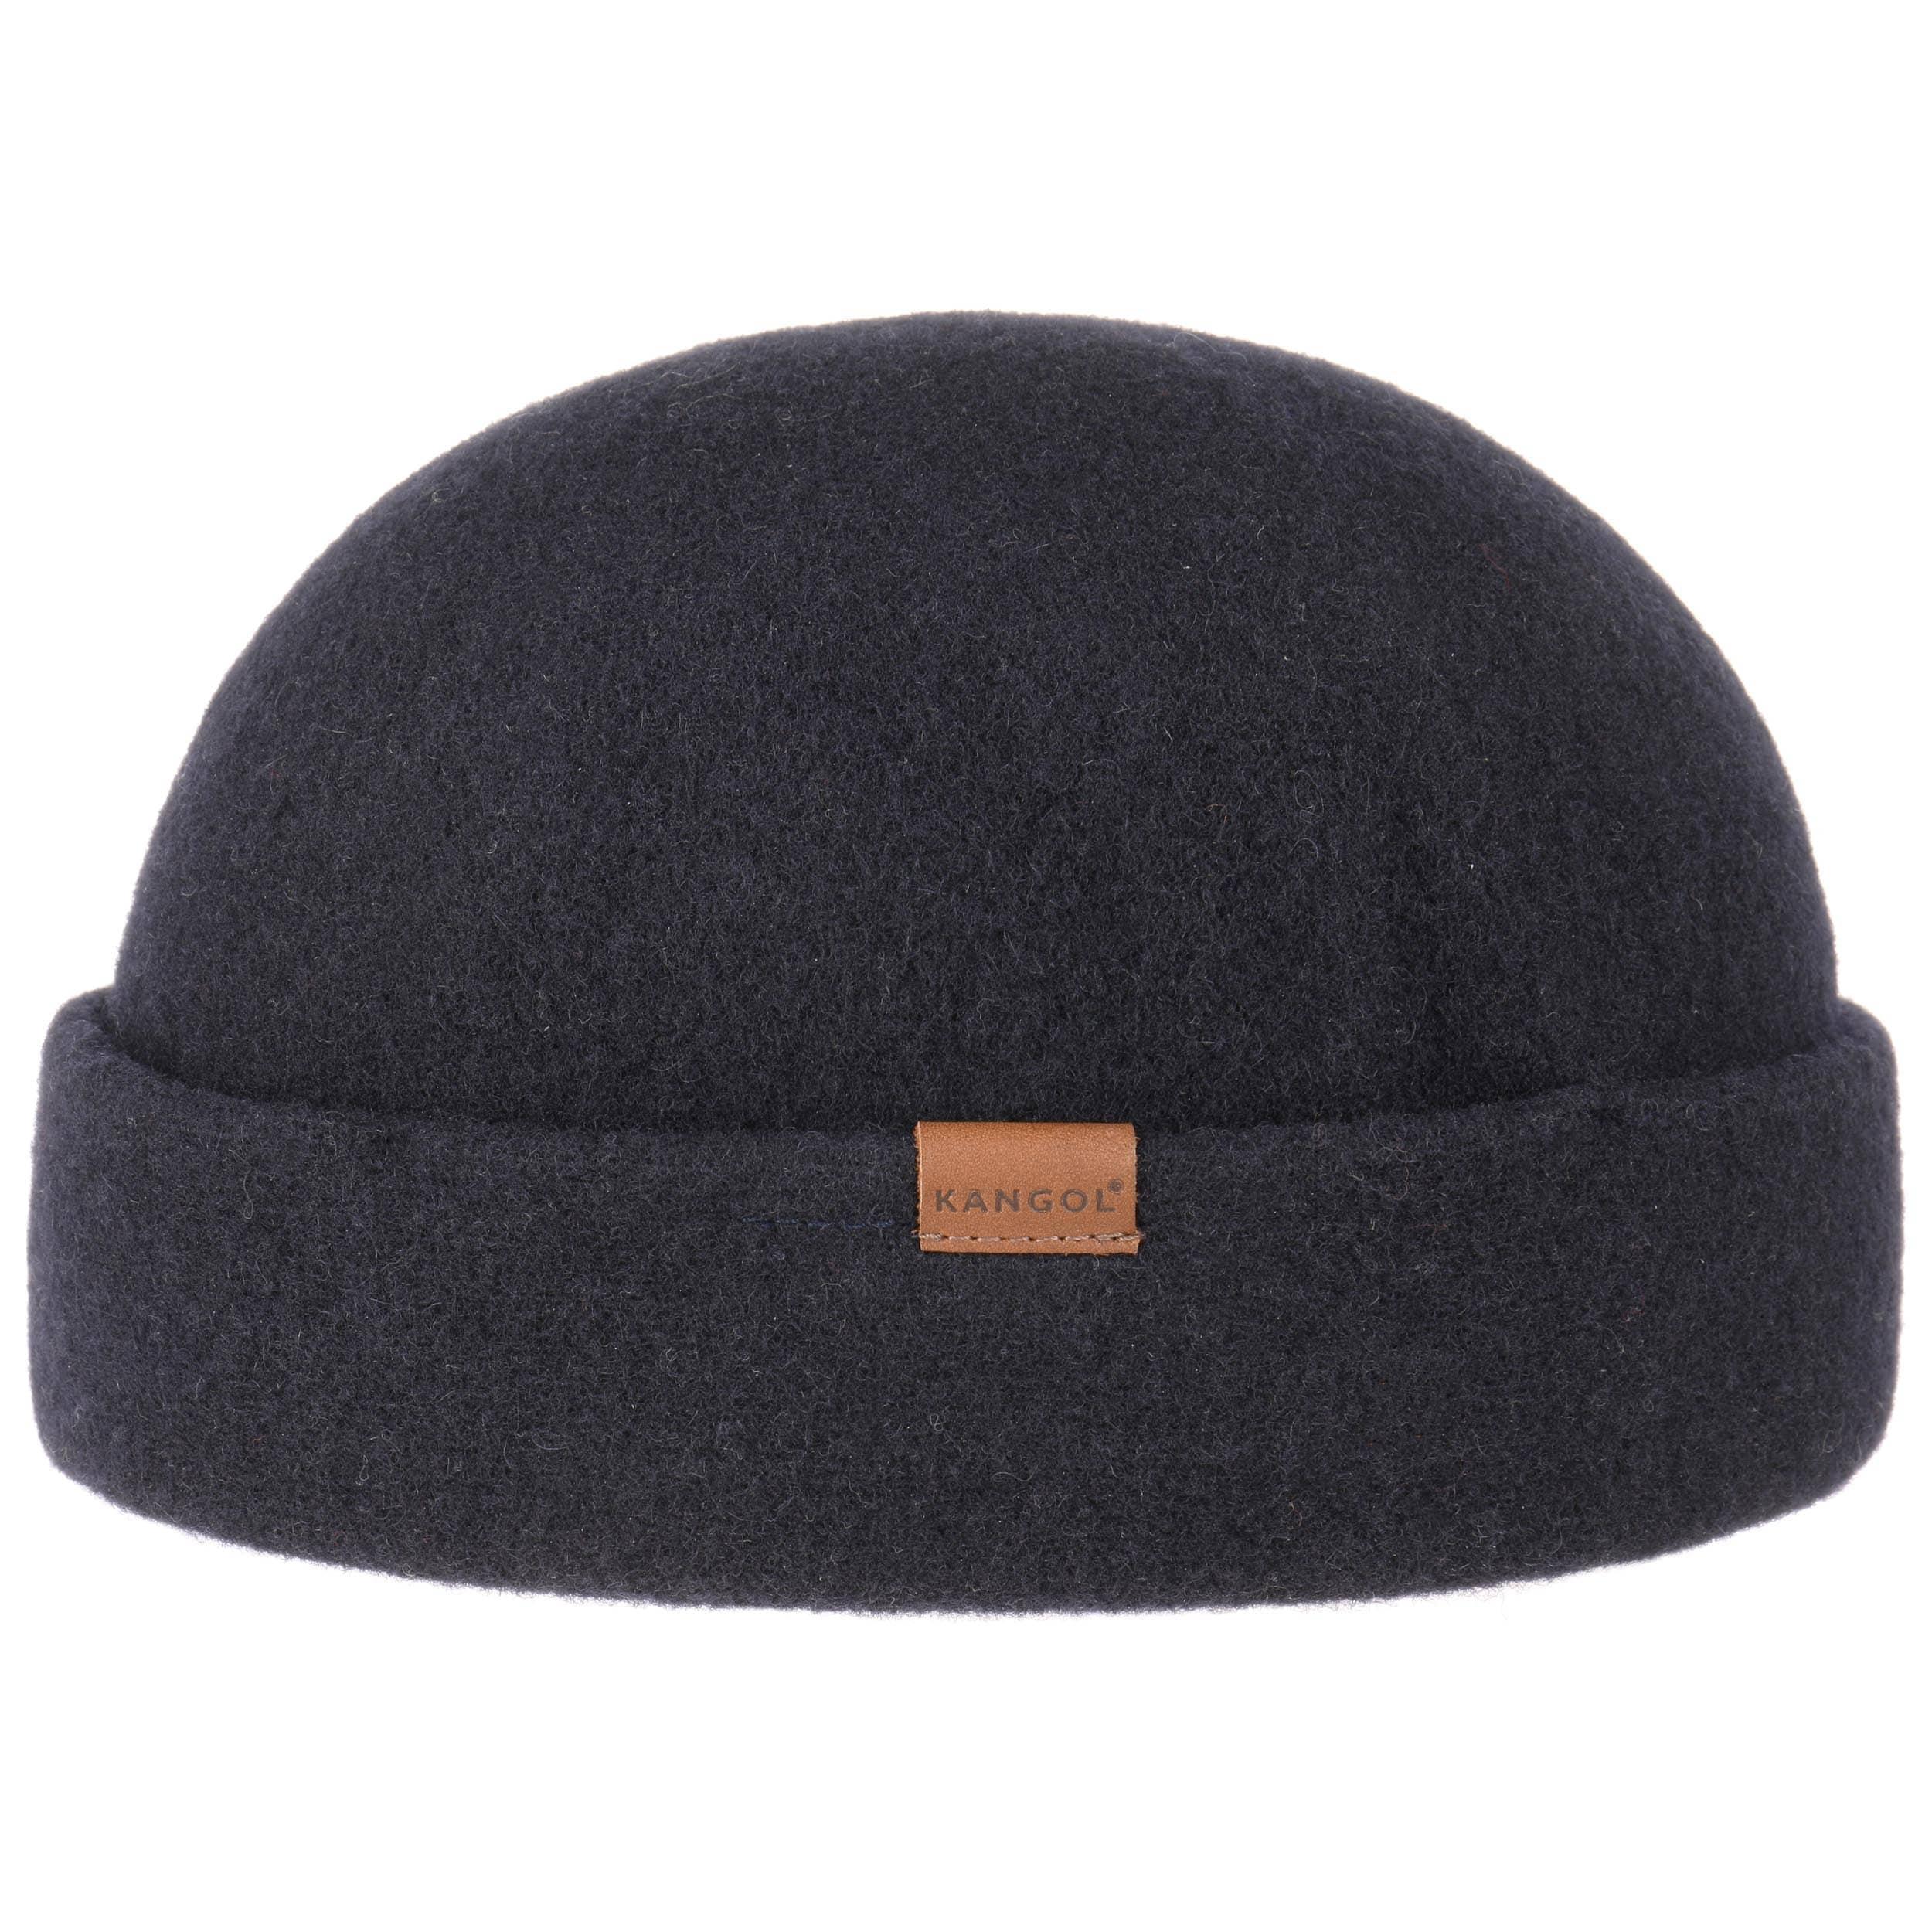 ... Reefer Docker Hat by Kangol - navy 4 ... c2f3f6bbd2d